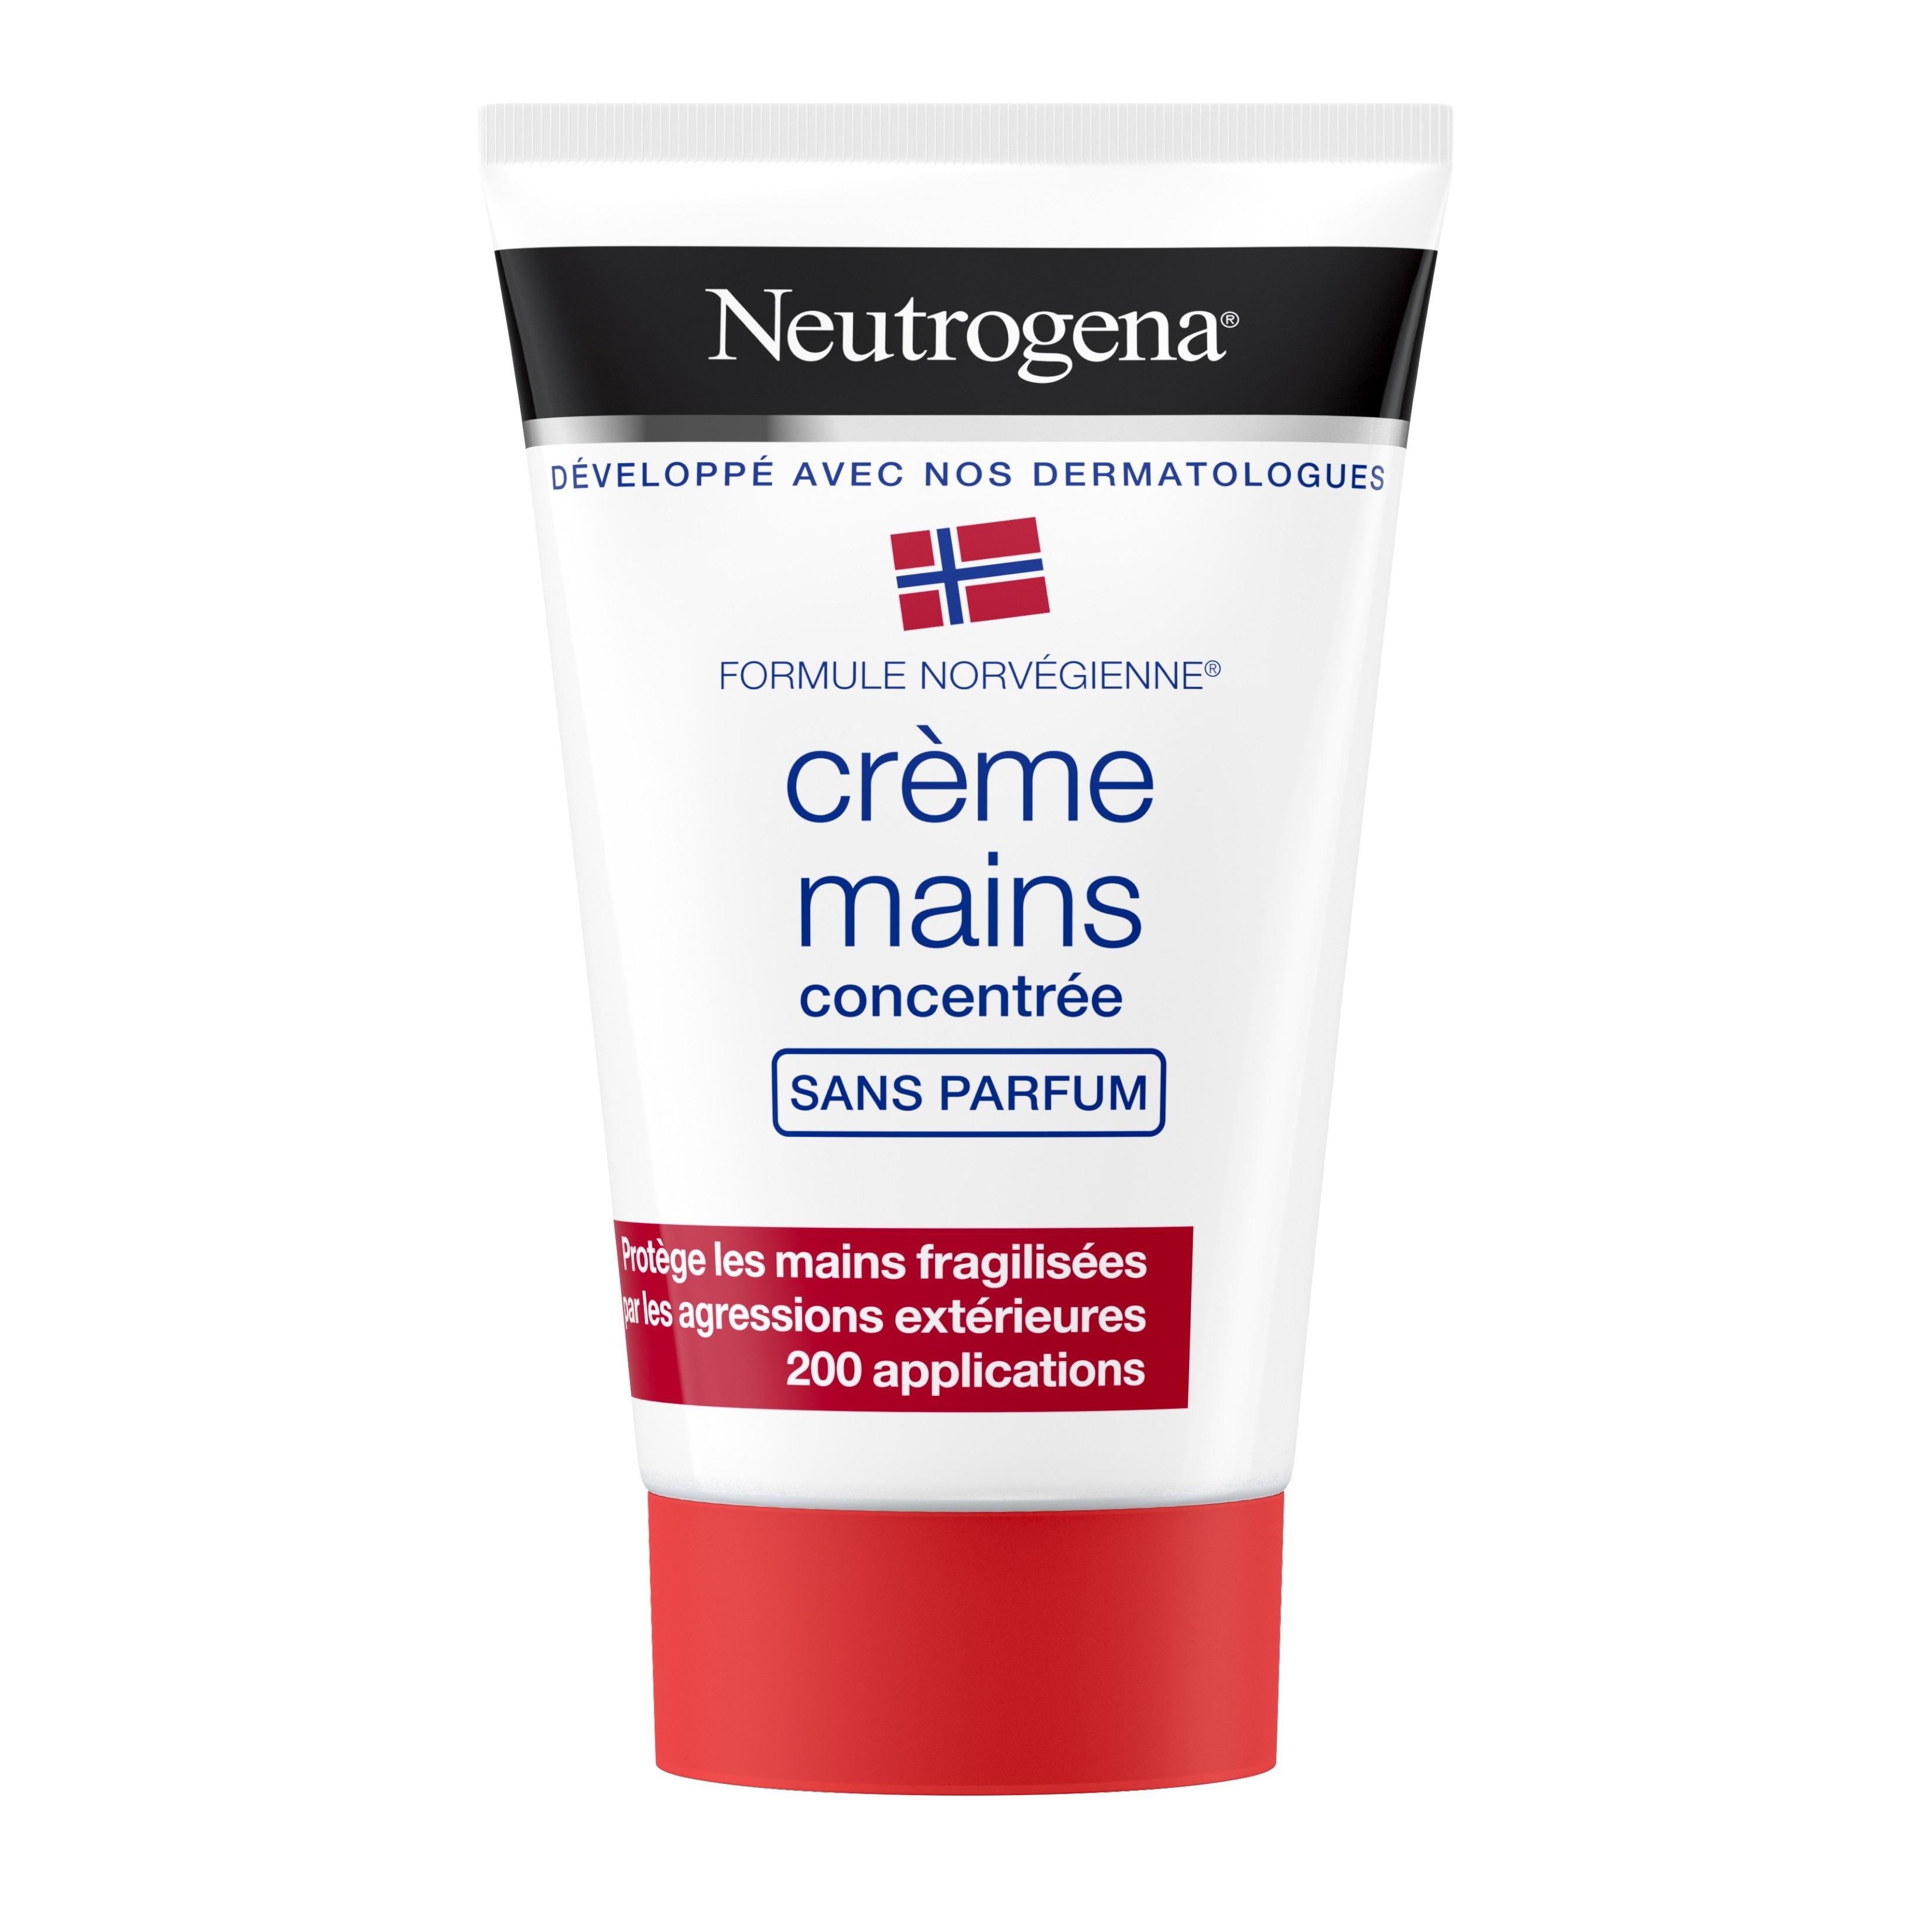 Image of Neutrogena crème apaisante sans parfum